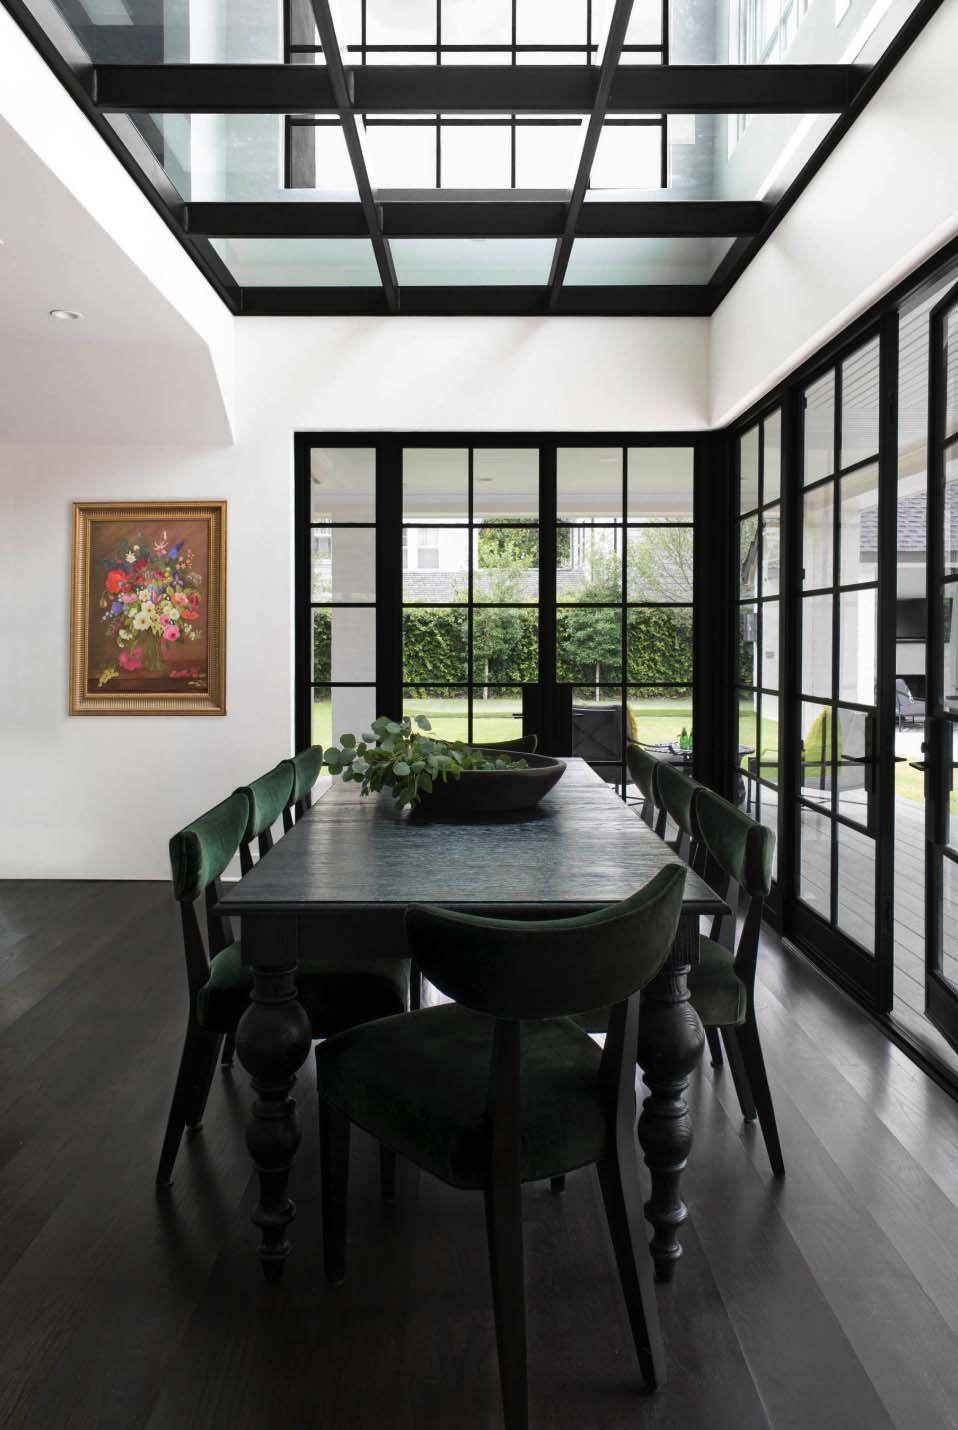 dining room decor ideas for many styles formal casual modern rh pinterest com